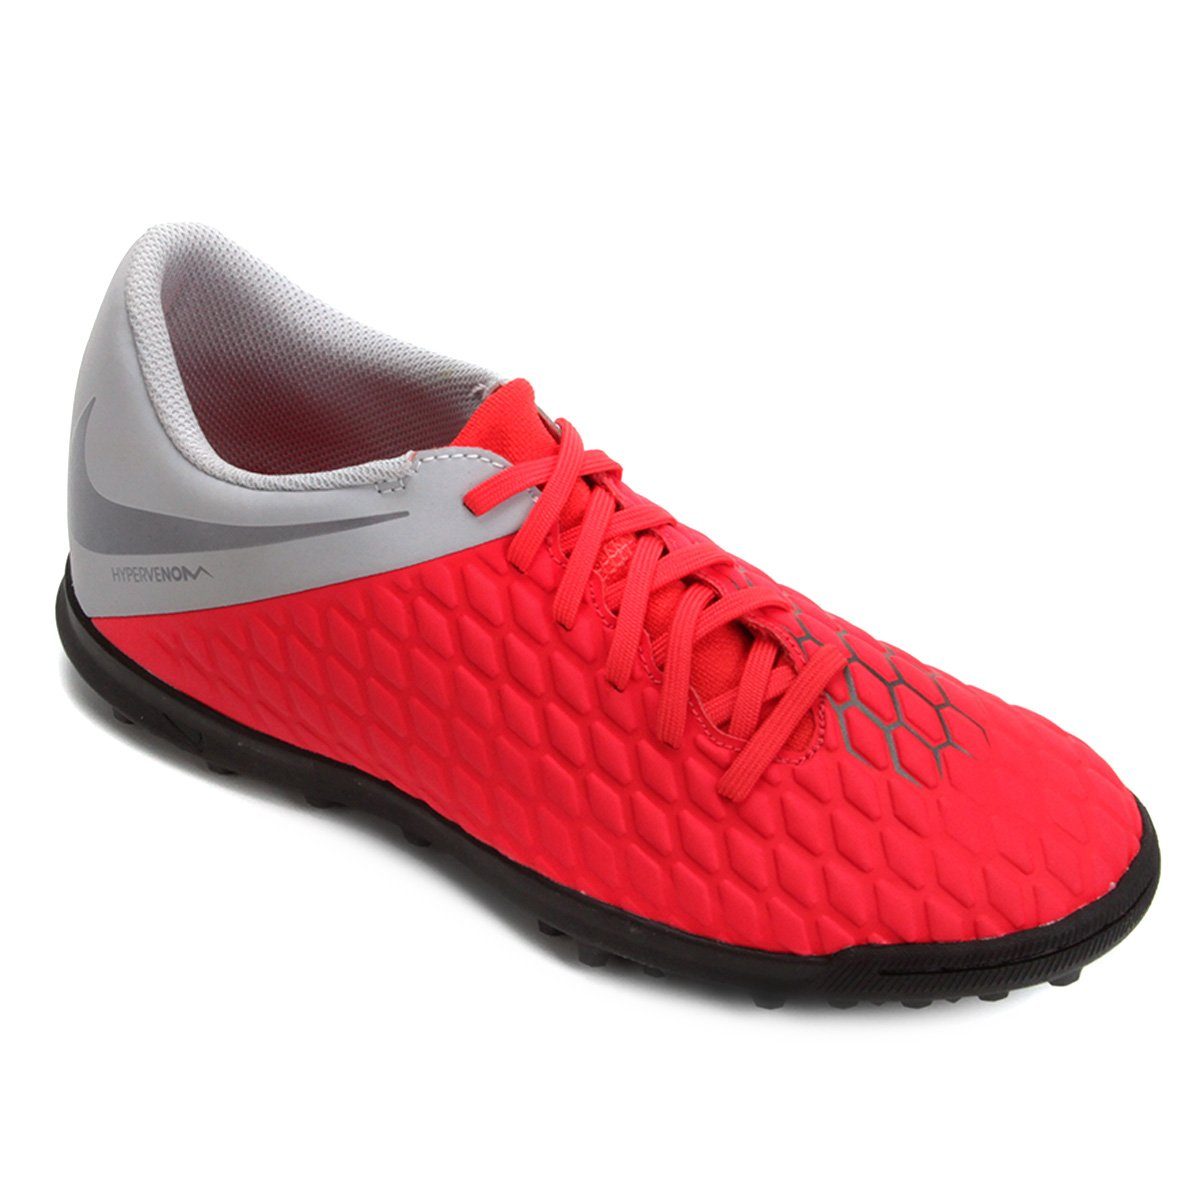 622fa82f2a624 Chuteira Society Nike Hypervenom Phantom 3 Club TF - Vermelho e Cinza -  Compre Agora